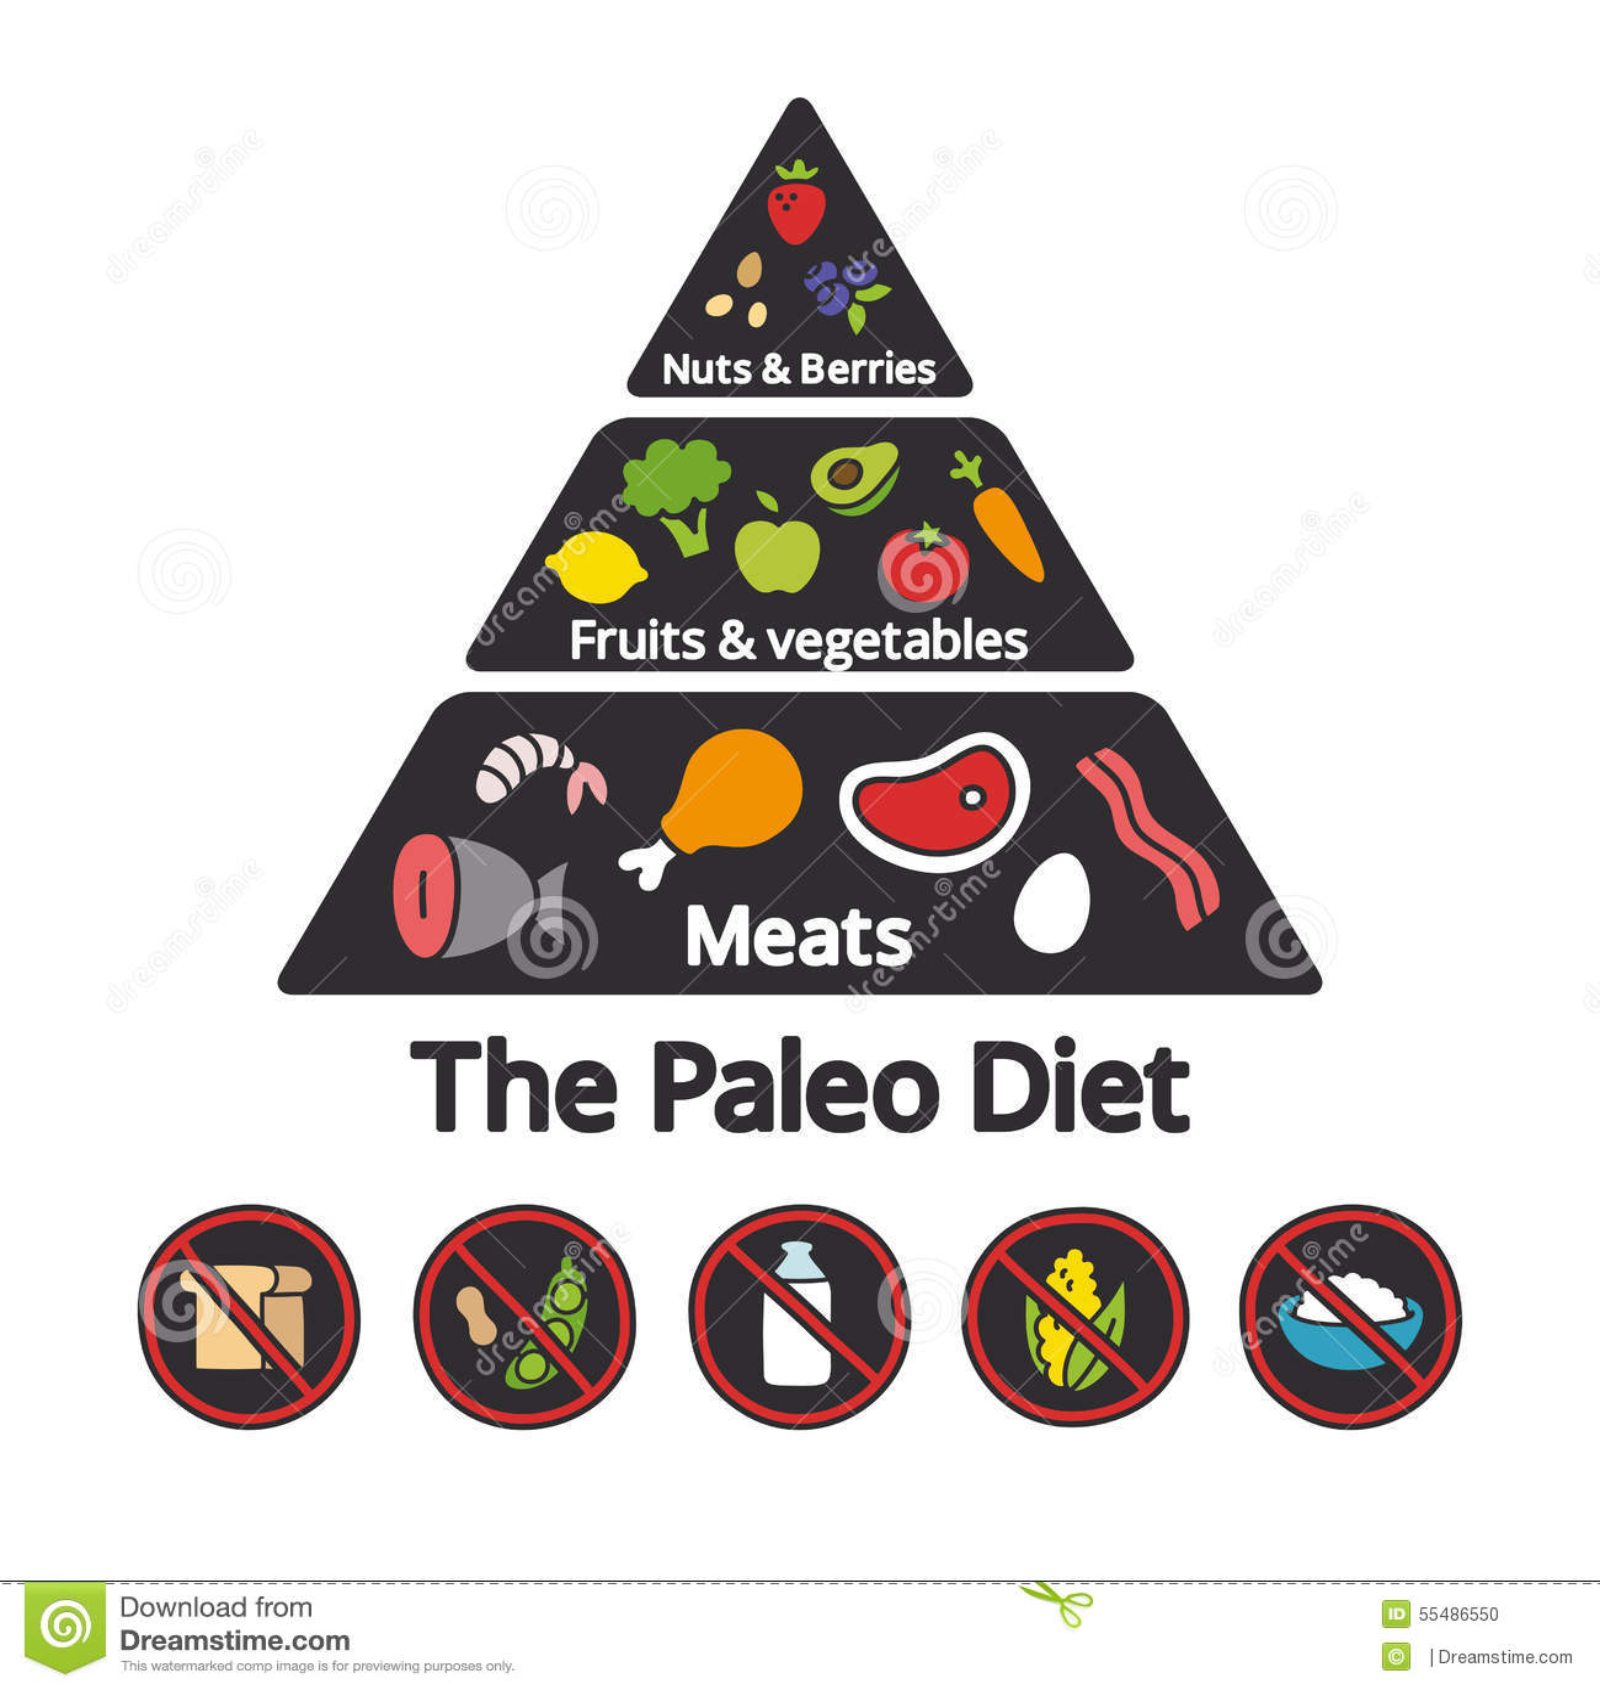 Paleo Food Pyramid Stock Illustration - Image: 55486550